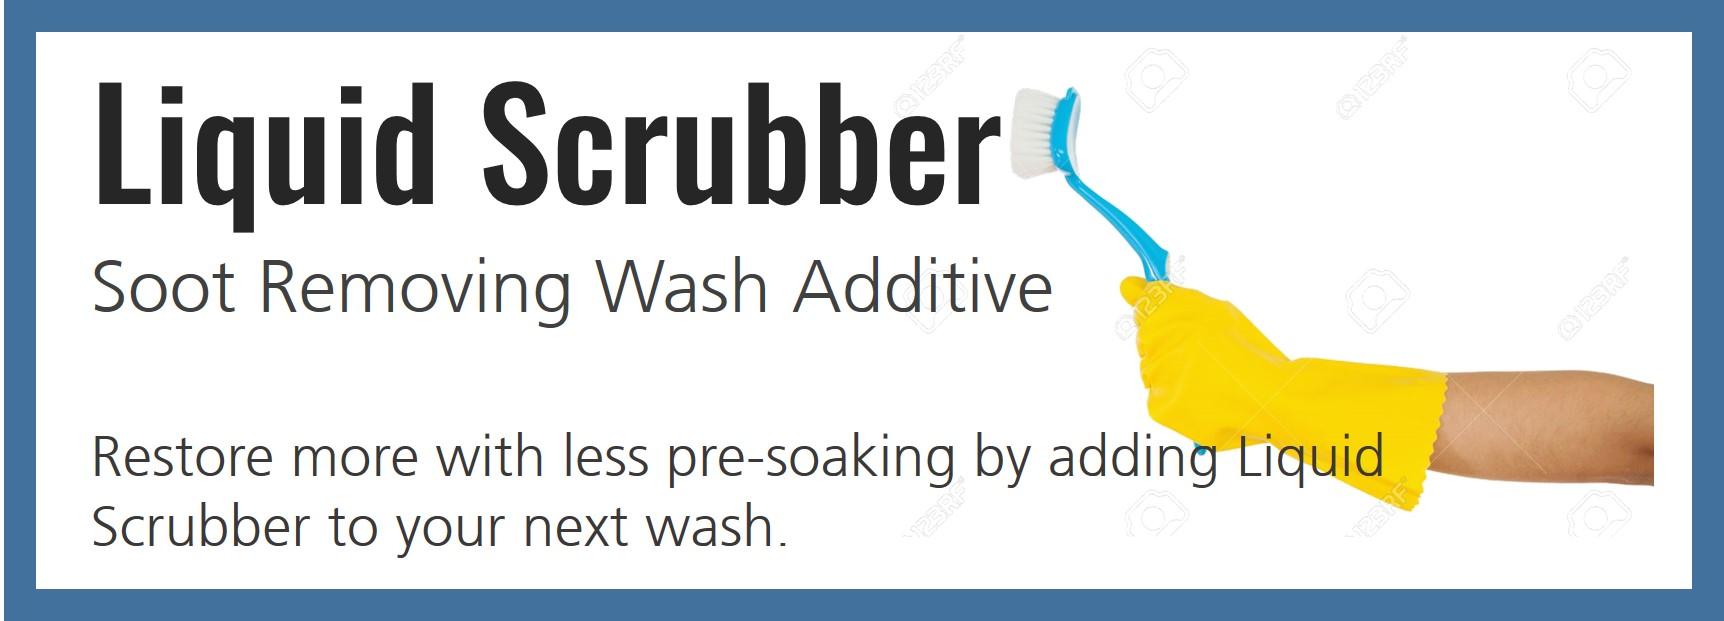 liquid-scrubber-banner.jpg